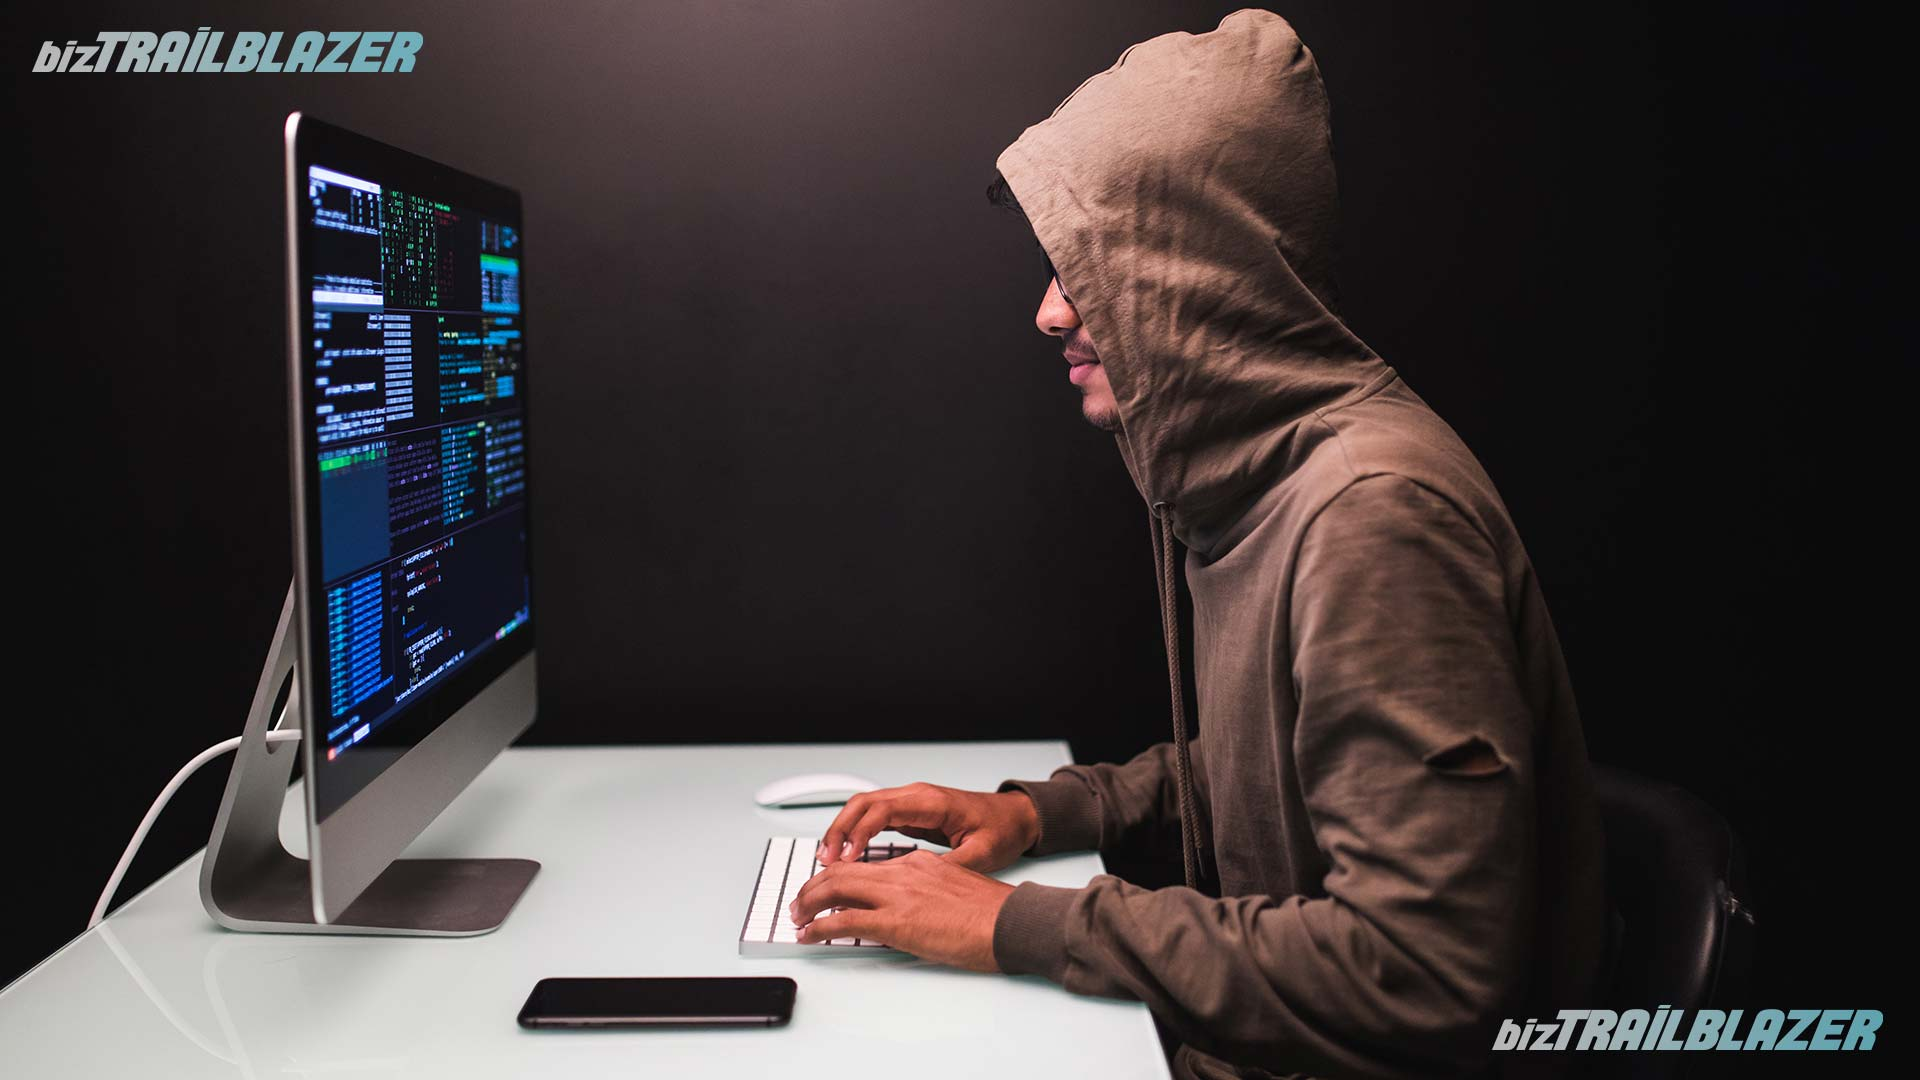 BizTrailBlazer-Blog-7-Best-Cybersecurity-Tools-To-Use-in-2020